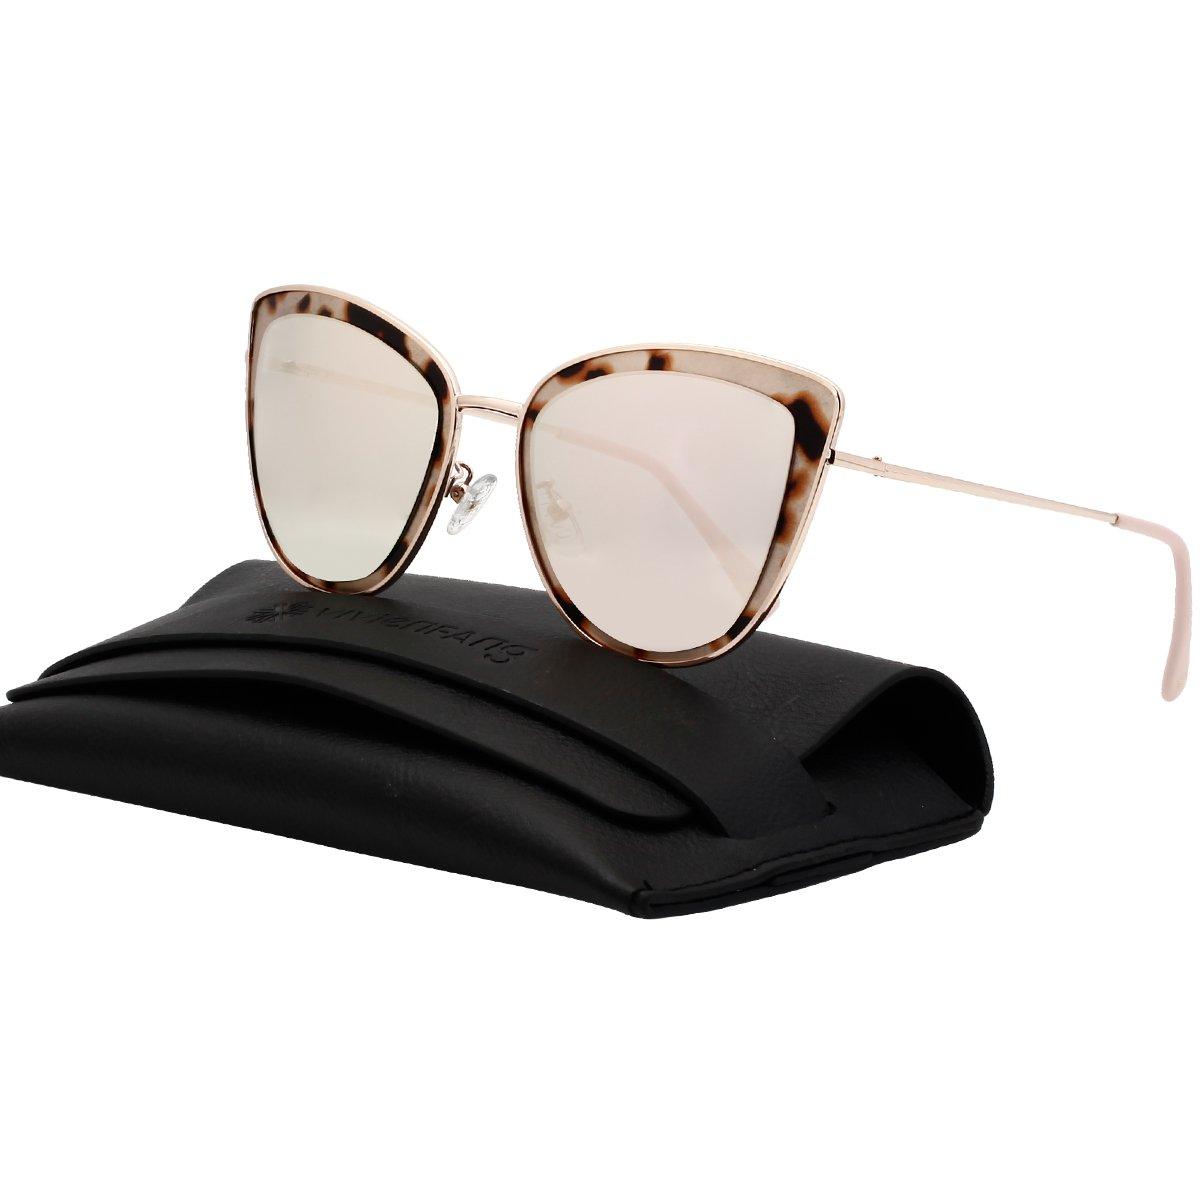 VIVIENFANG Mirror Lens Oversized Women Cateye Sunglasses Leopard Print Metal Frame Shades G87566A Pink